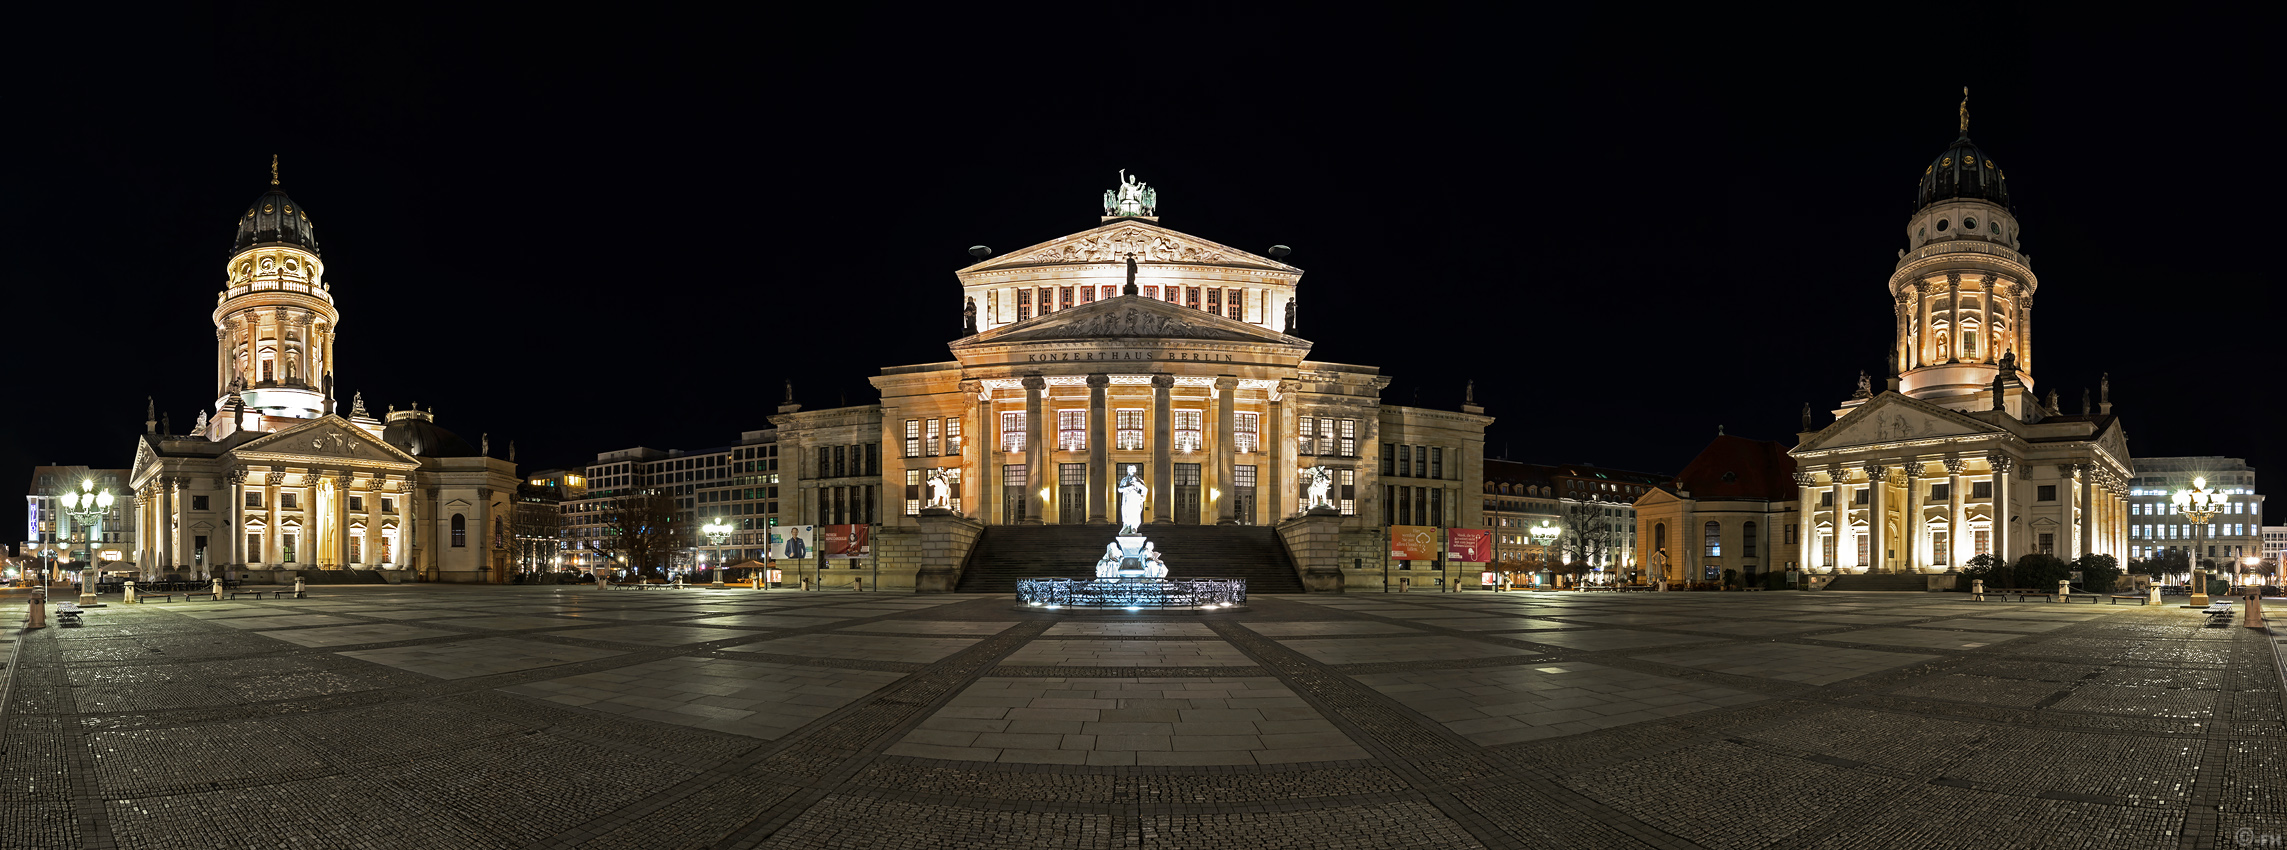 Gendarmenmarkt_night_Pano_k